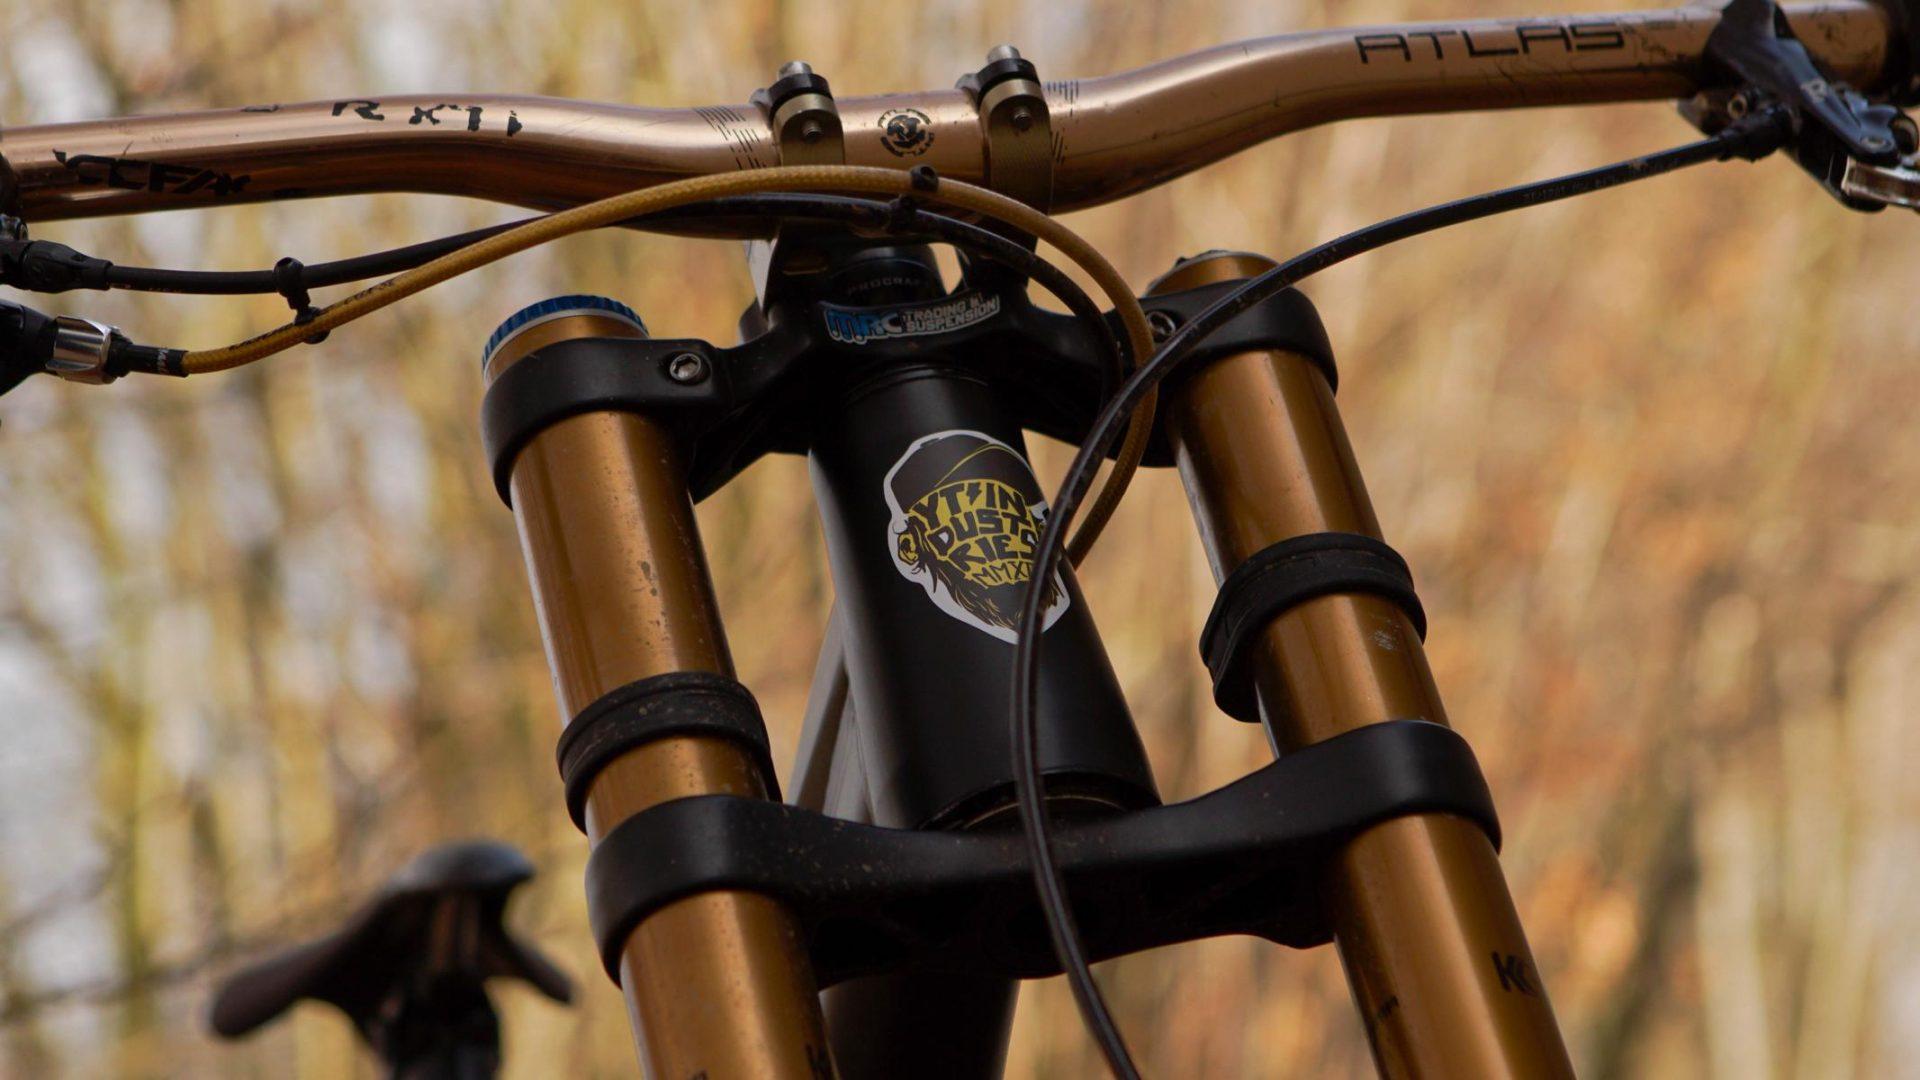 Downhill Dream Bike 2019 - Custom Radon Swoop 210 matt black /Fox 40 / CaneCreek / Hope Evo / LG1r / Sram X01 /77 desings/ Reverse / Purple